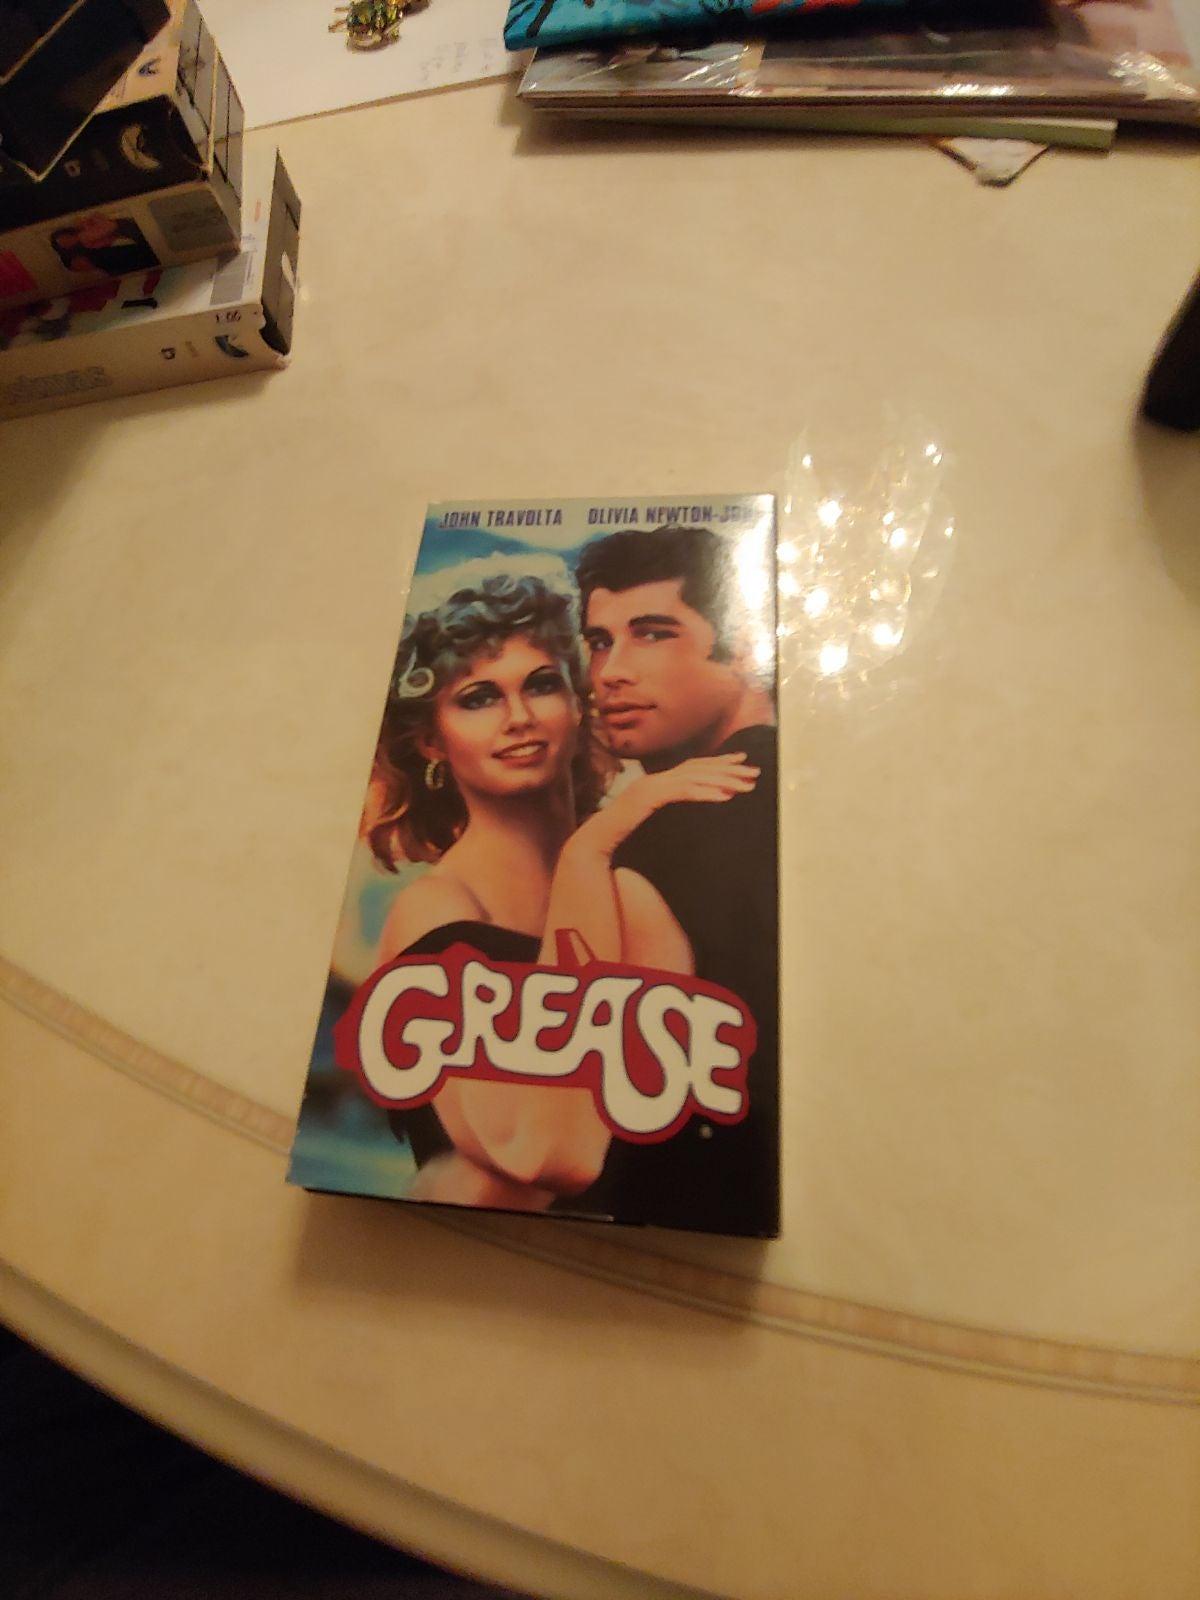 Grease VHS 1977